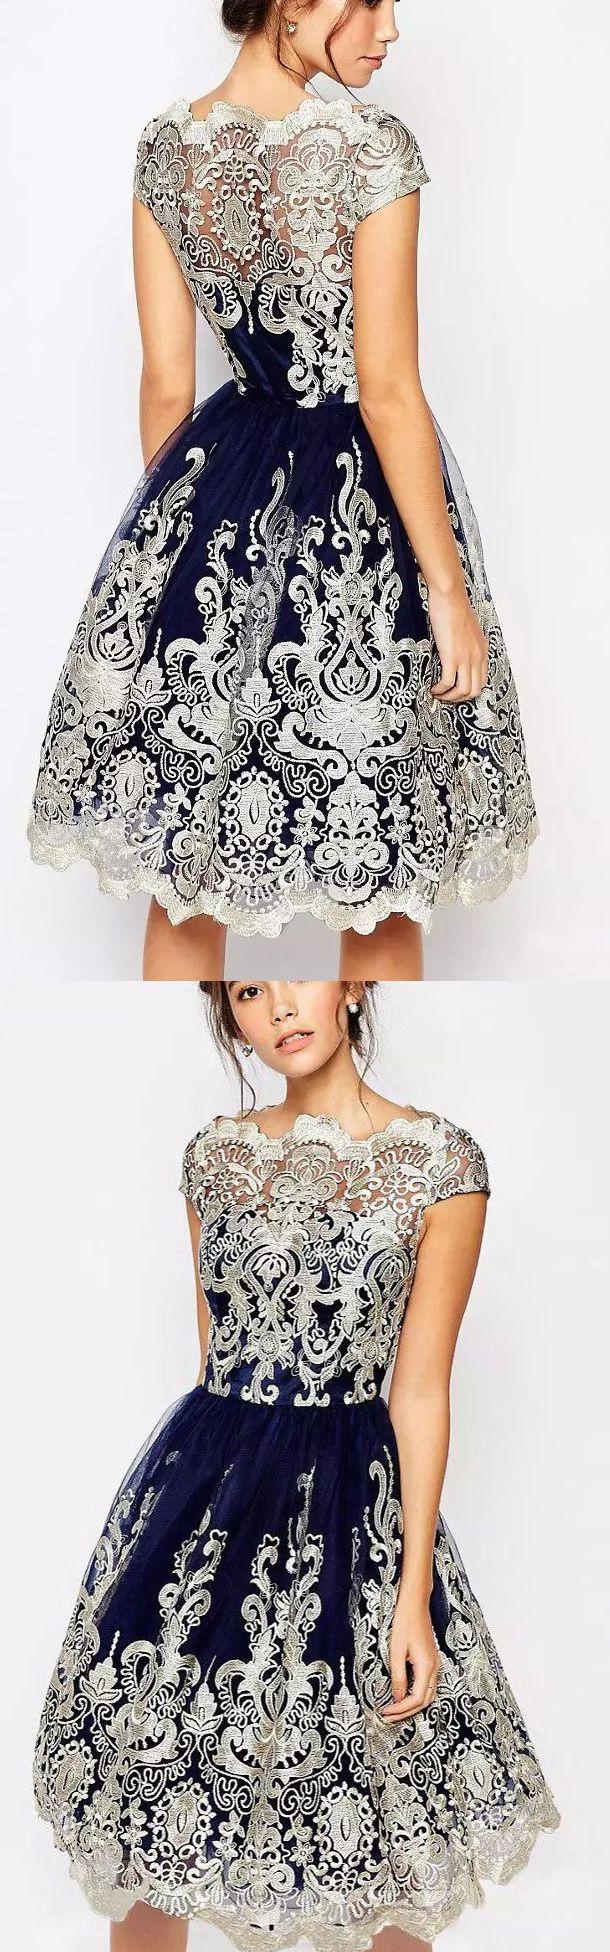 Short prom dresses cute prom dresses prom dresses short navy prom